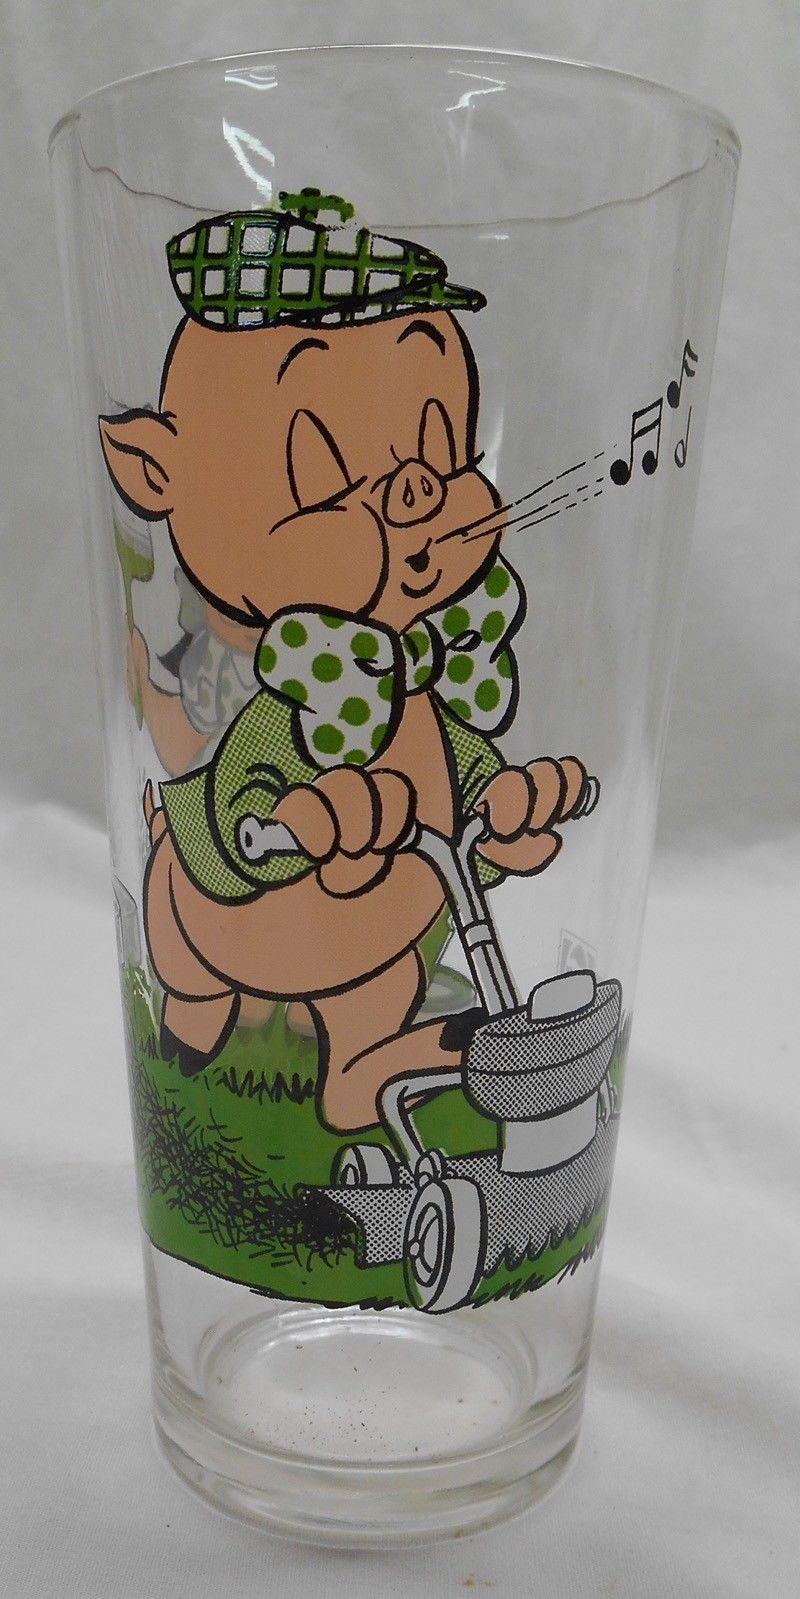 Petunia Porky Pig Pepsi Glass 1976 Warner Bros Looney Tunes